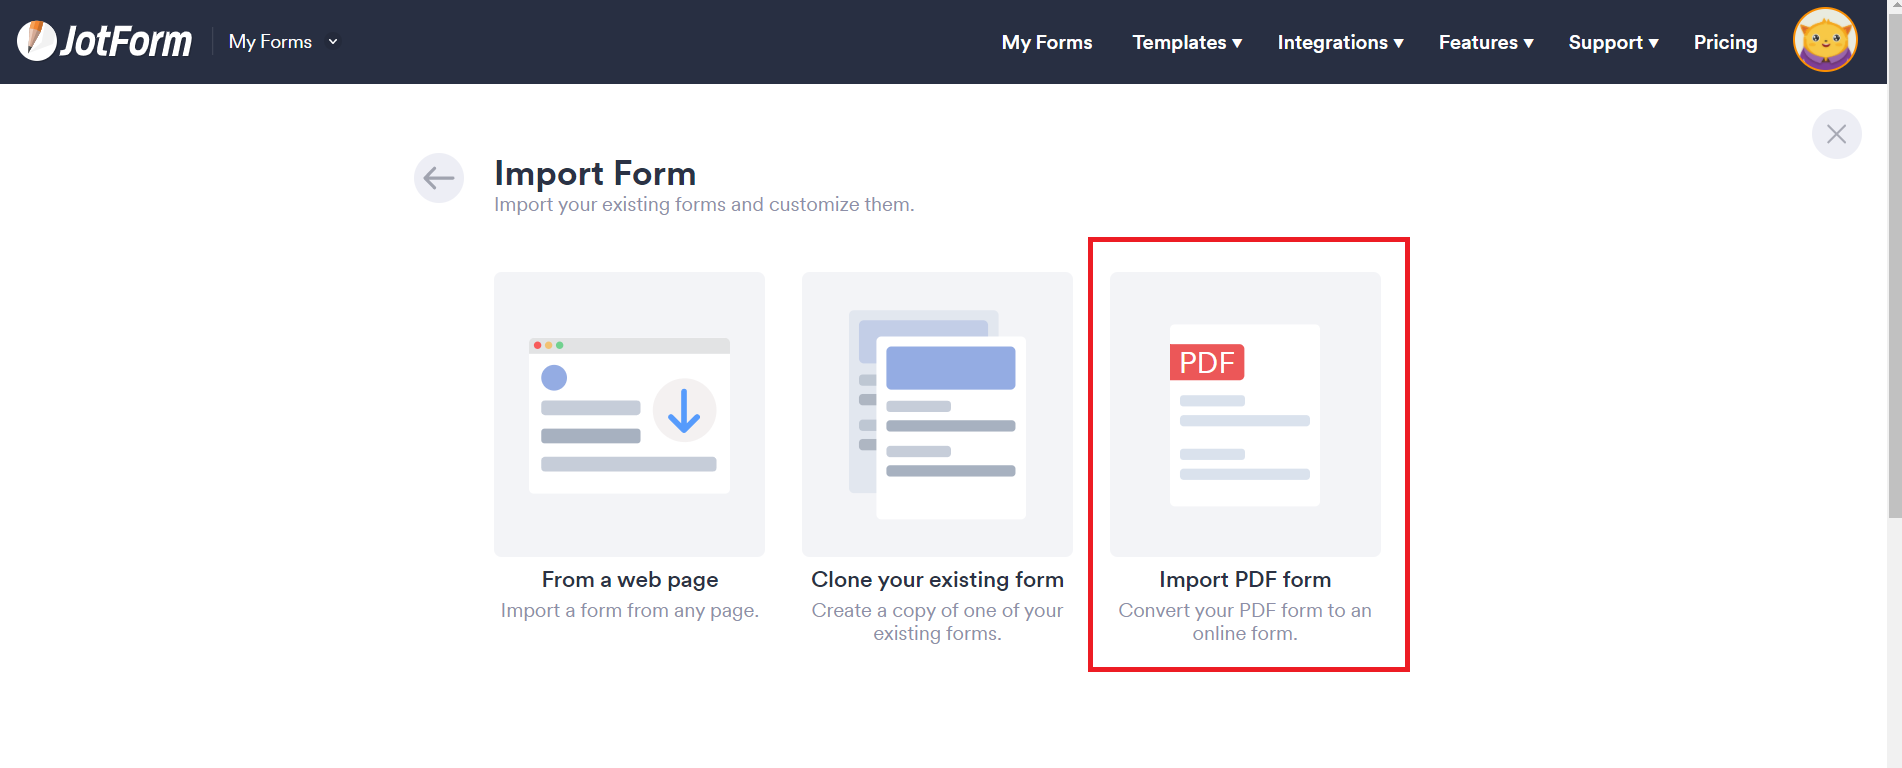 import PDF form in jotform